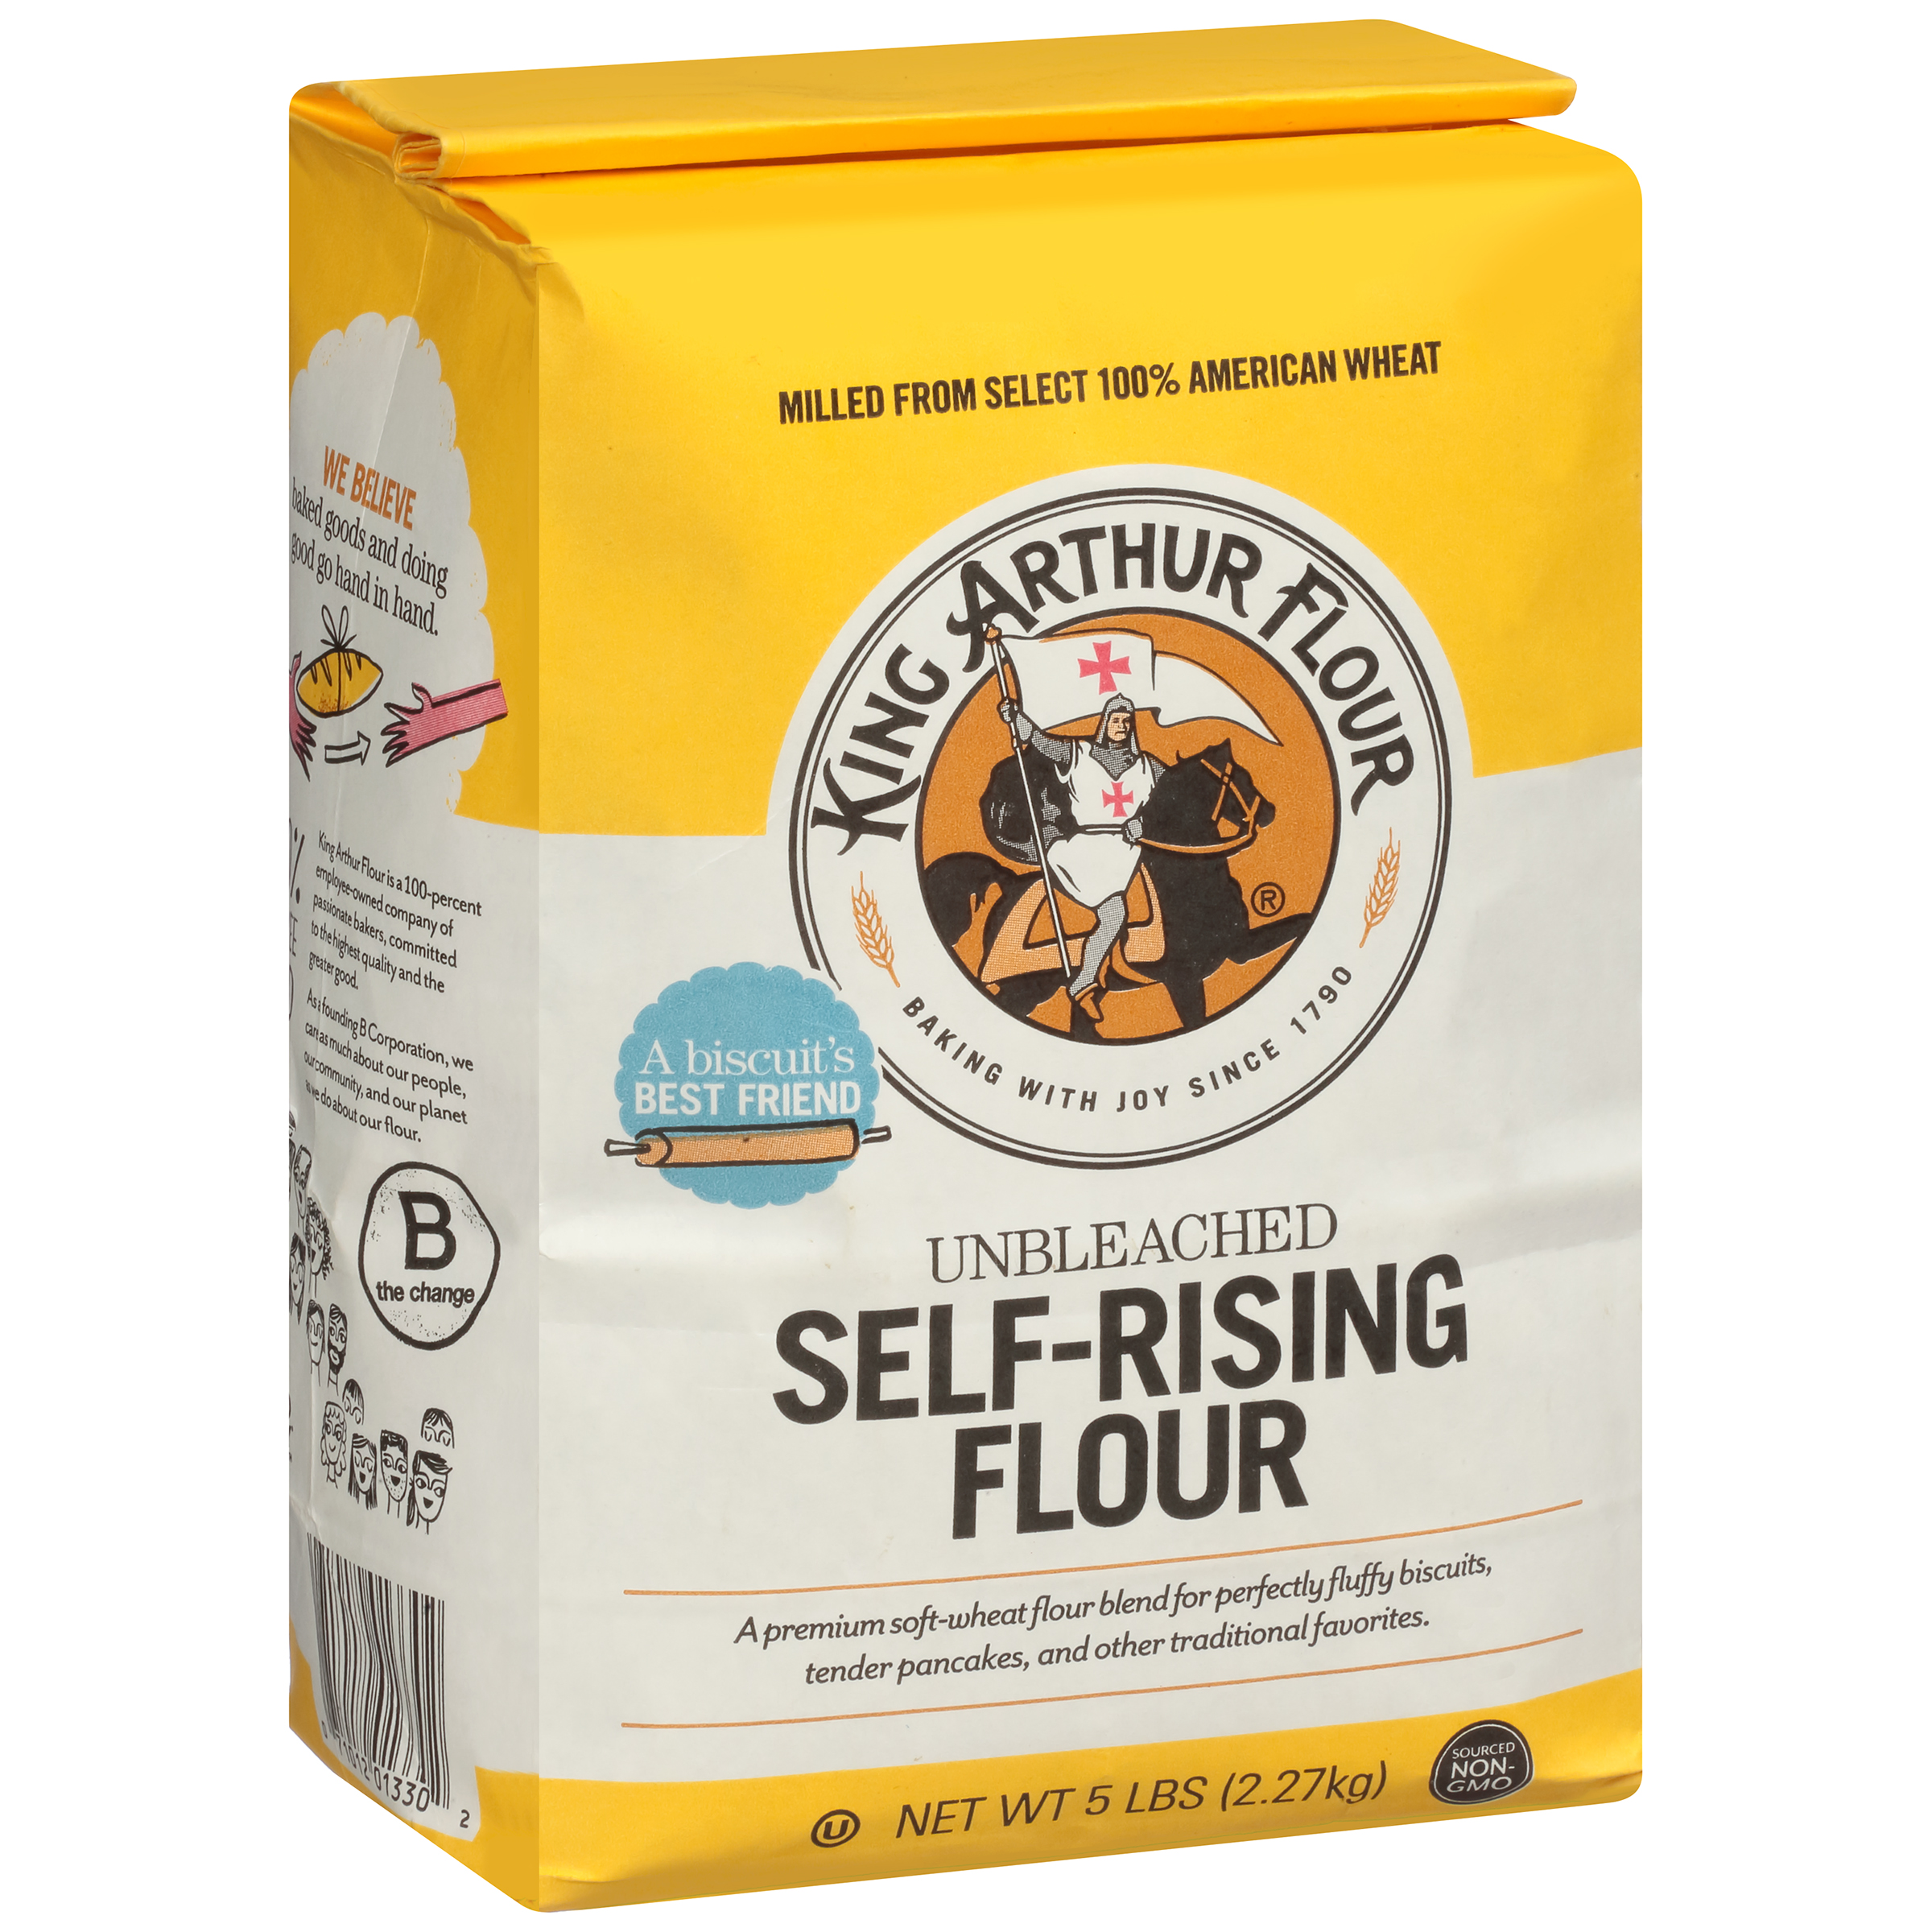 King arhtur flour